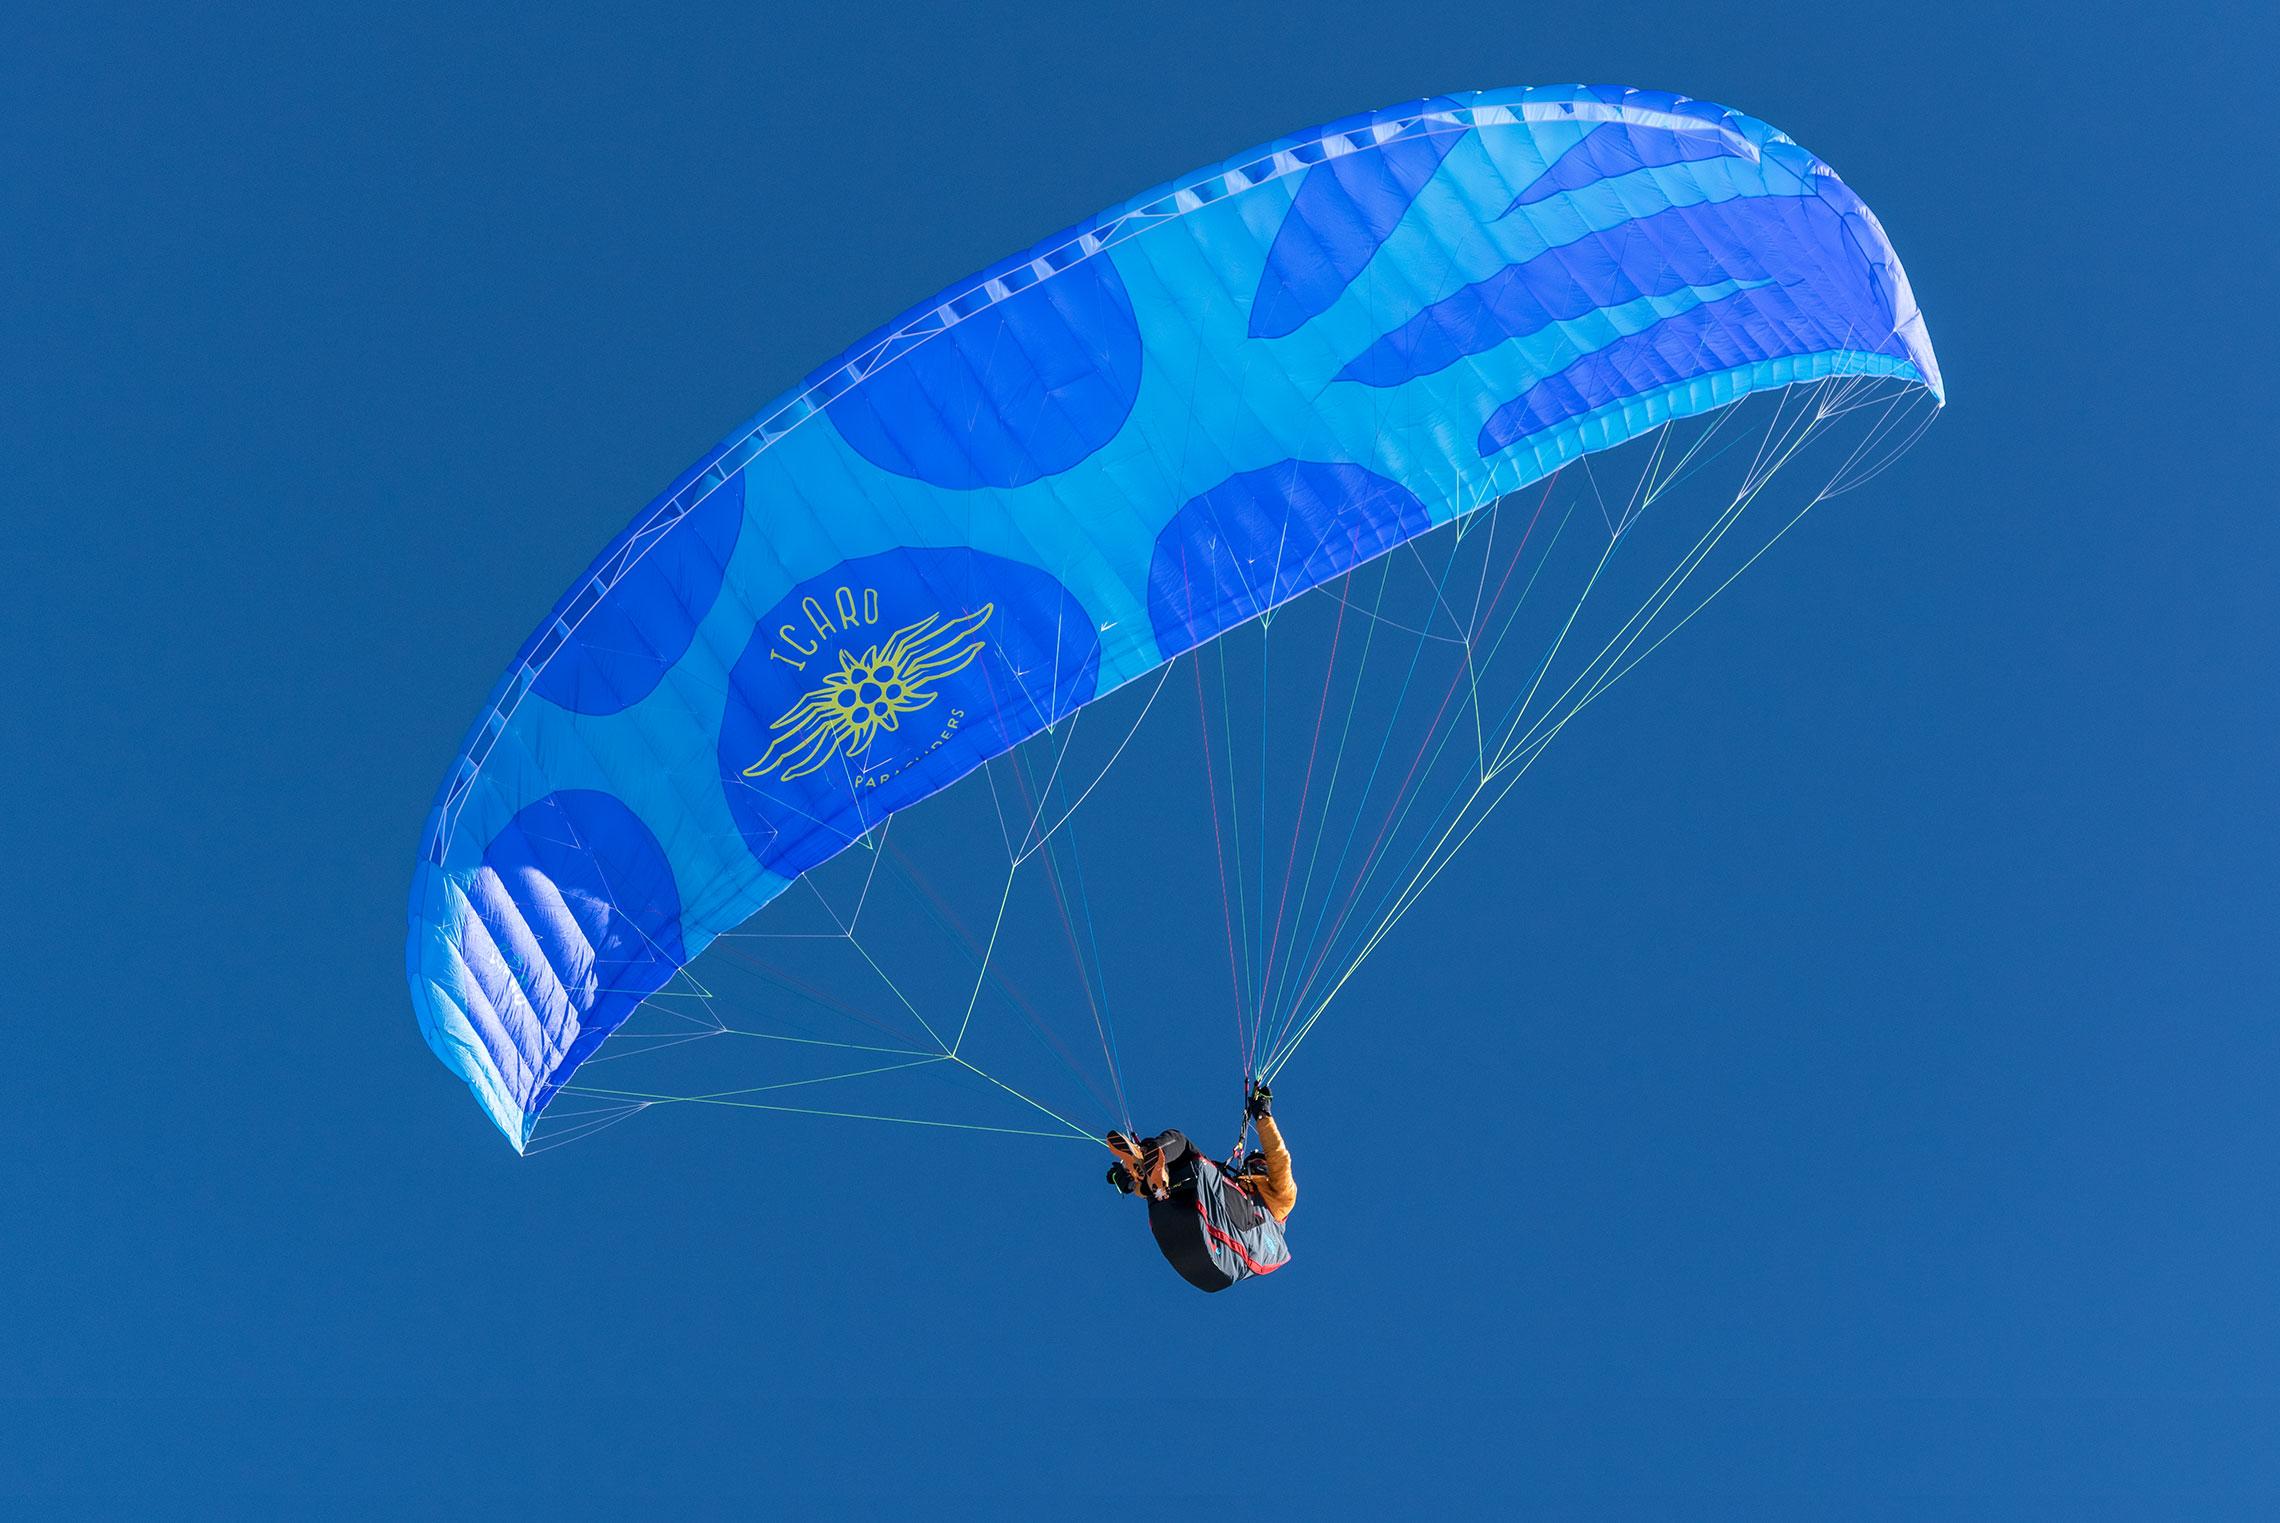 icaro_paraglider_instinct-te_gallery_02